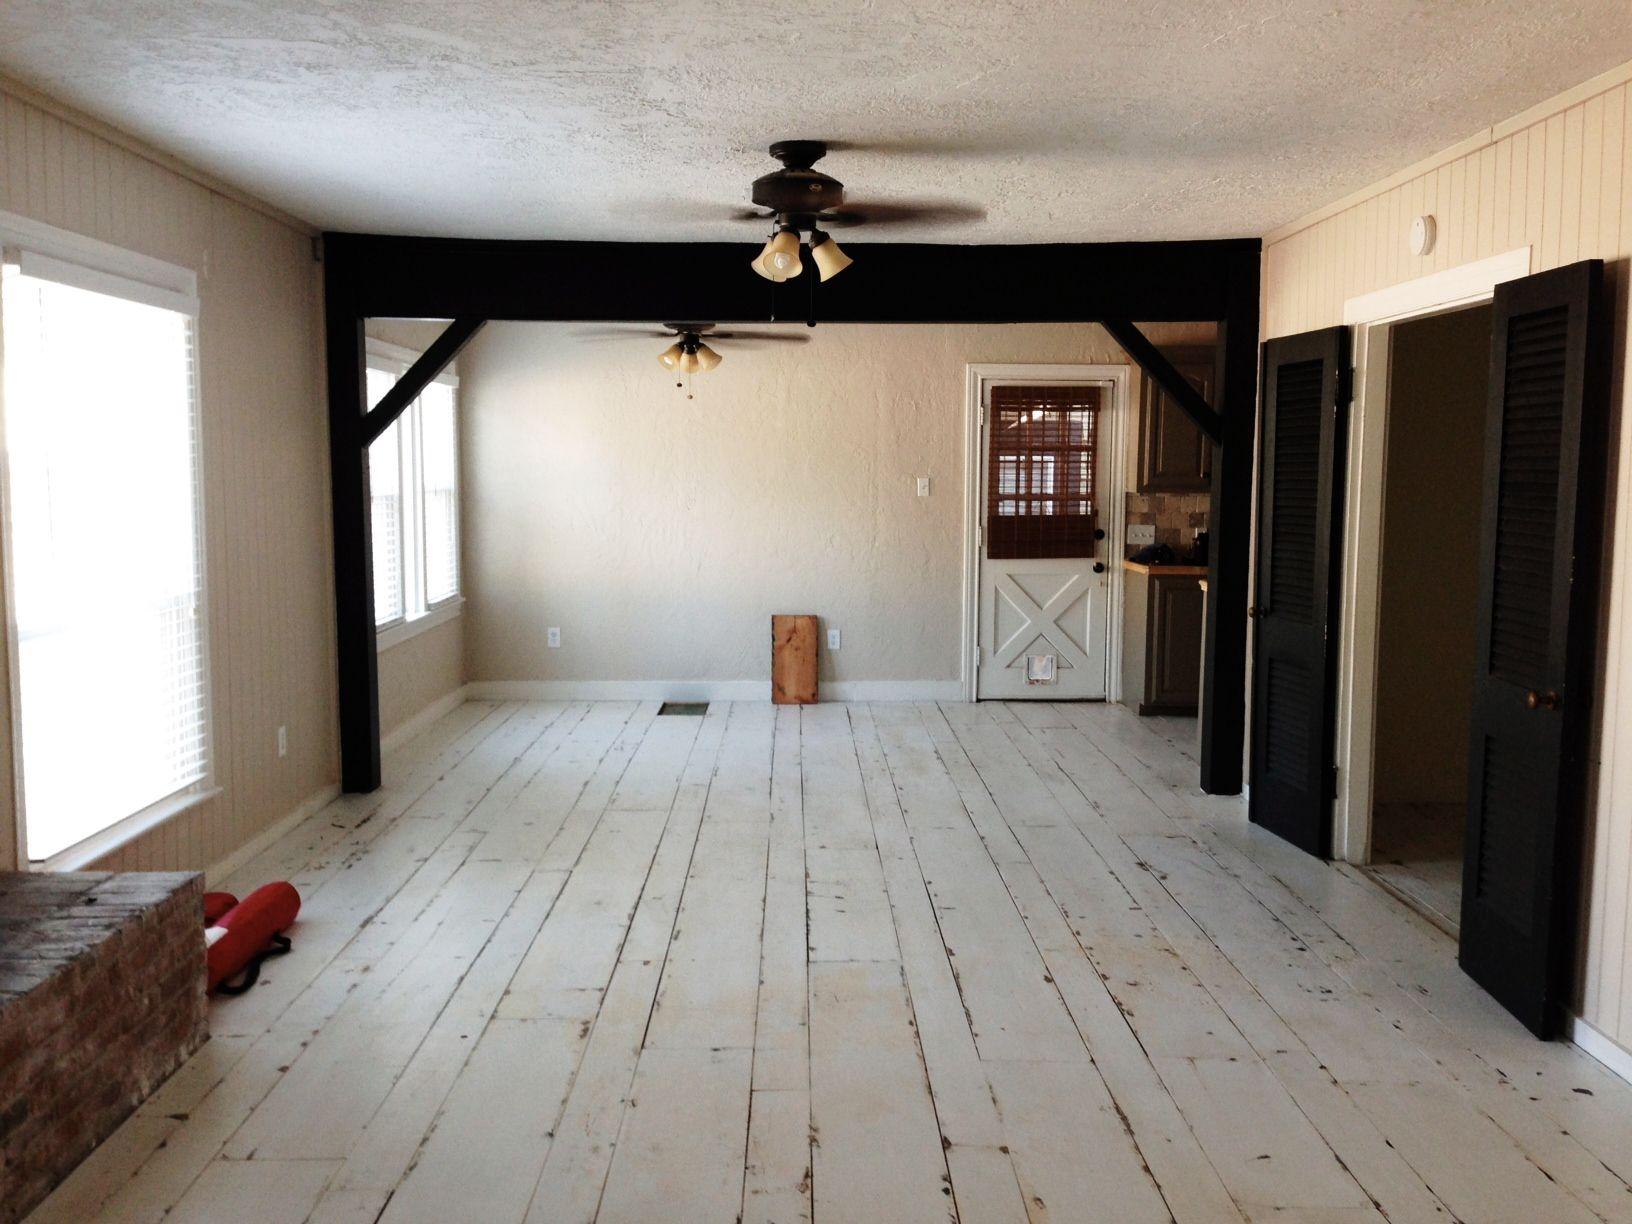 bedroom flooring carpet or hardwood | design ideas 2017-2018 ...